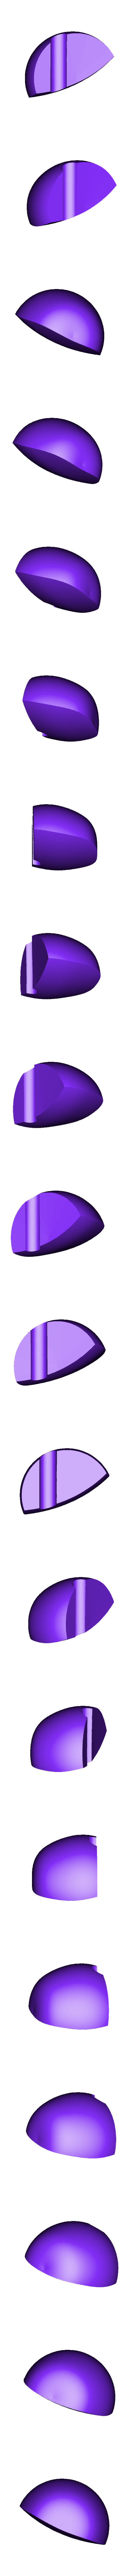 eye_left_white.stl Download free STL file Badtz-Maru (バッドばつ丸, Baddo Batsu Maru) • 3D printable design, Jangie